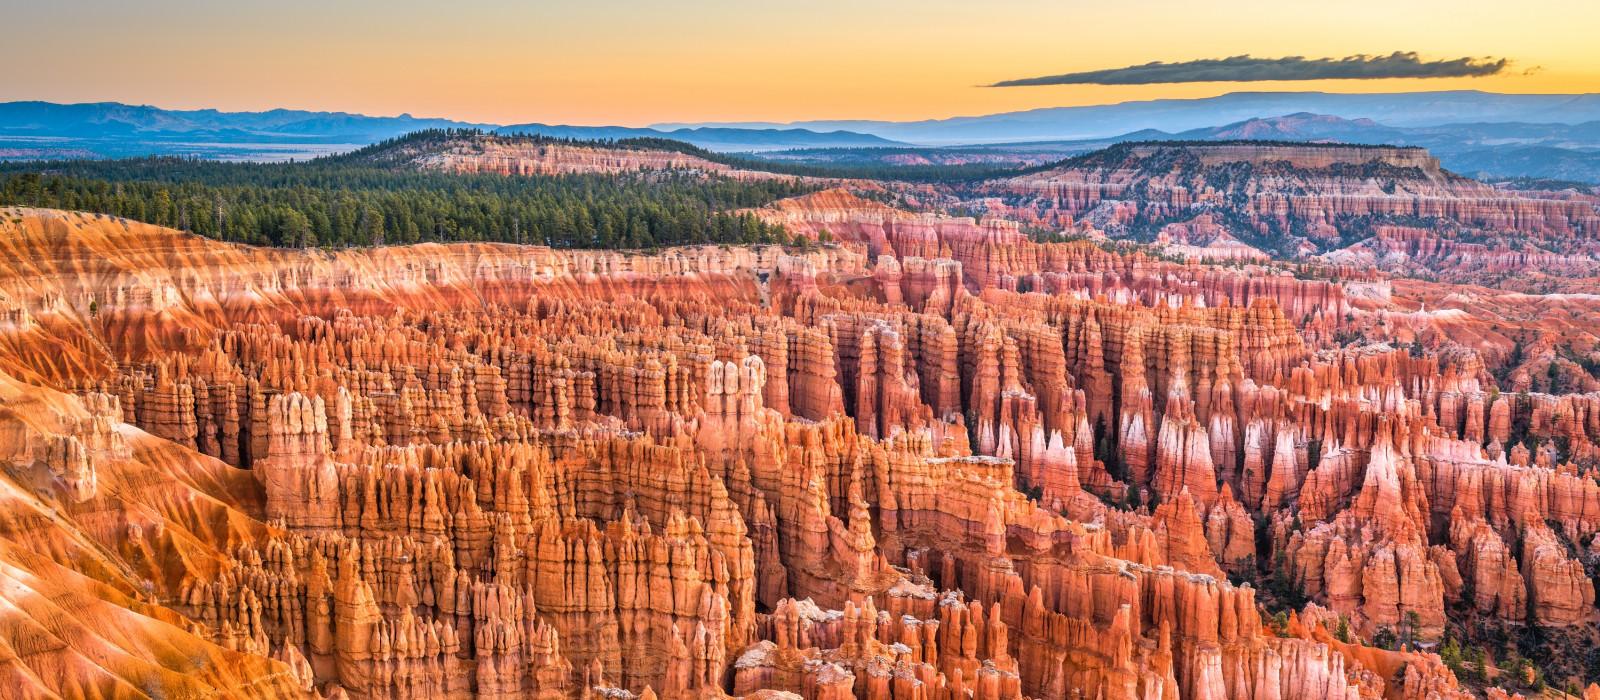 Destination Bryce Canyon National Park USA